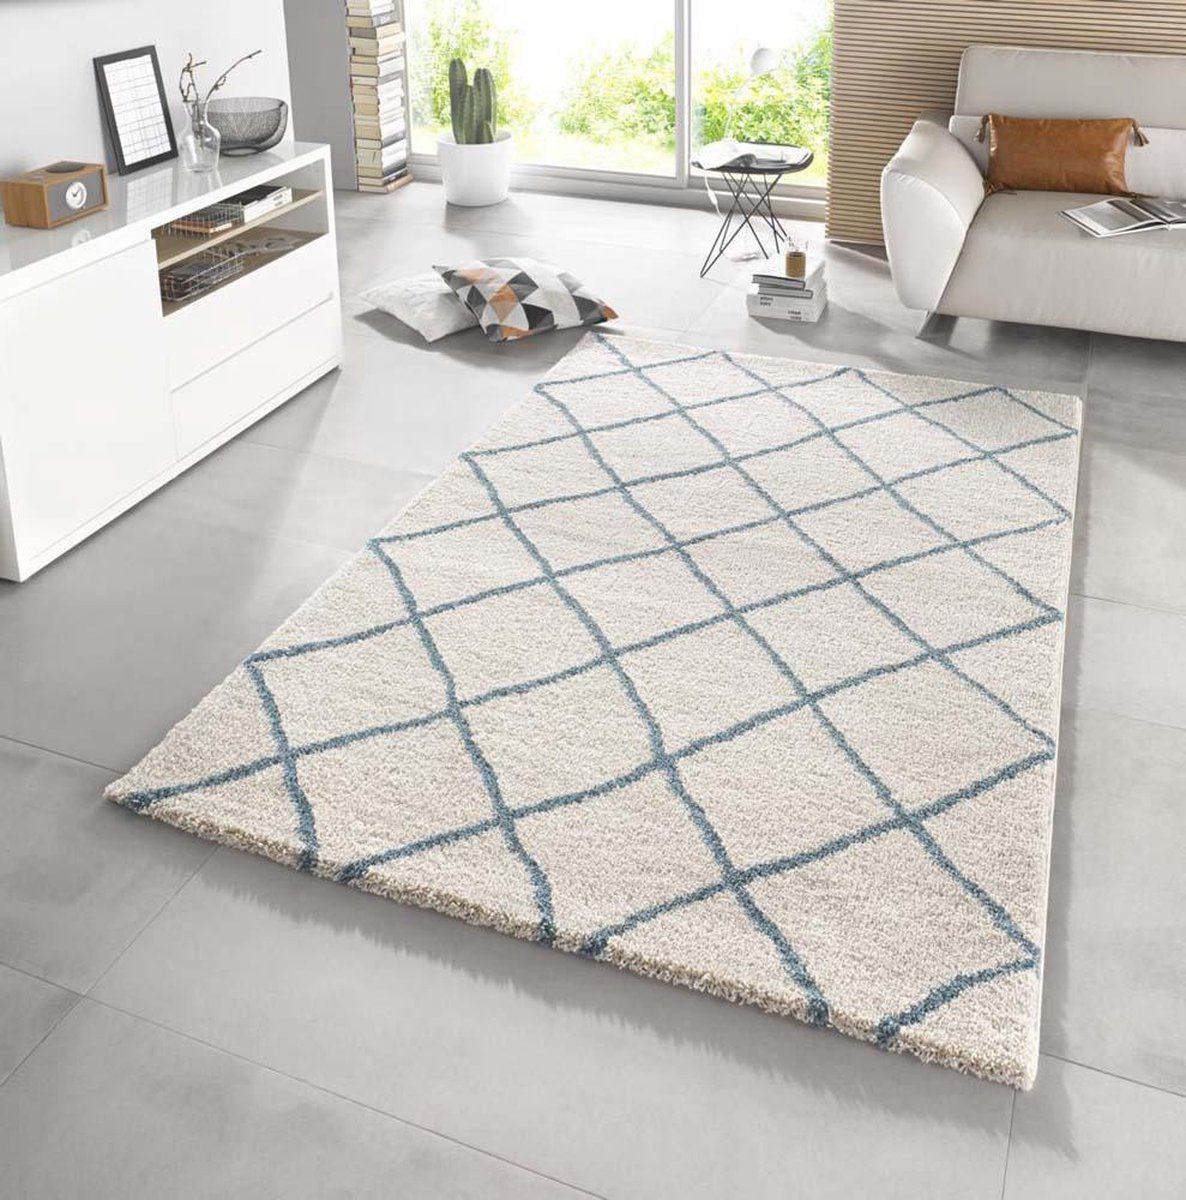 Hoogpolig vloerkleed - Rana Lines creme/blauw 80x150cm - Mint rugs